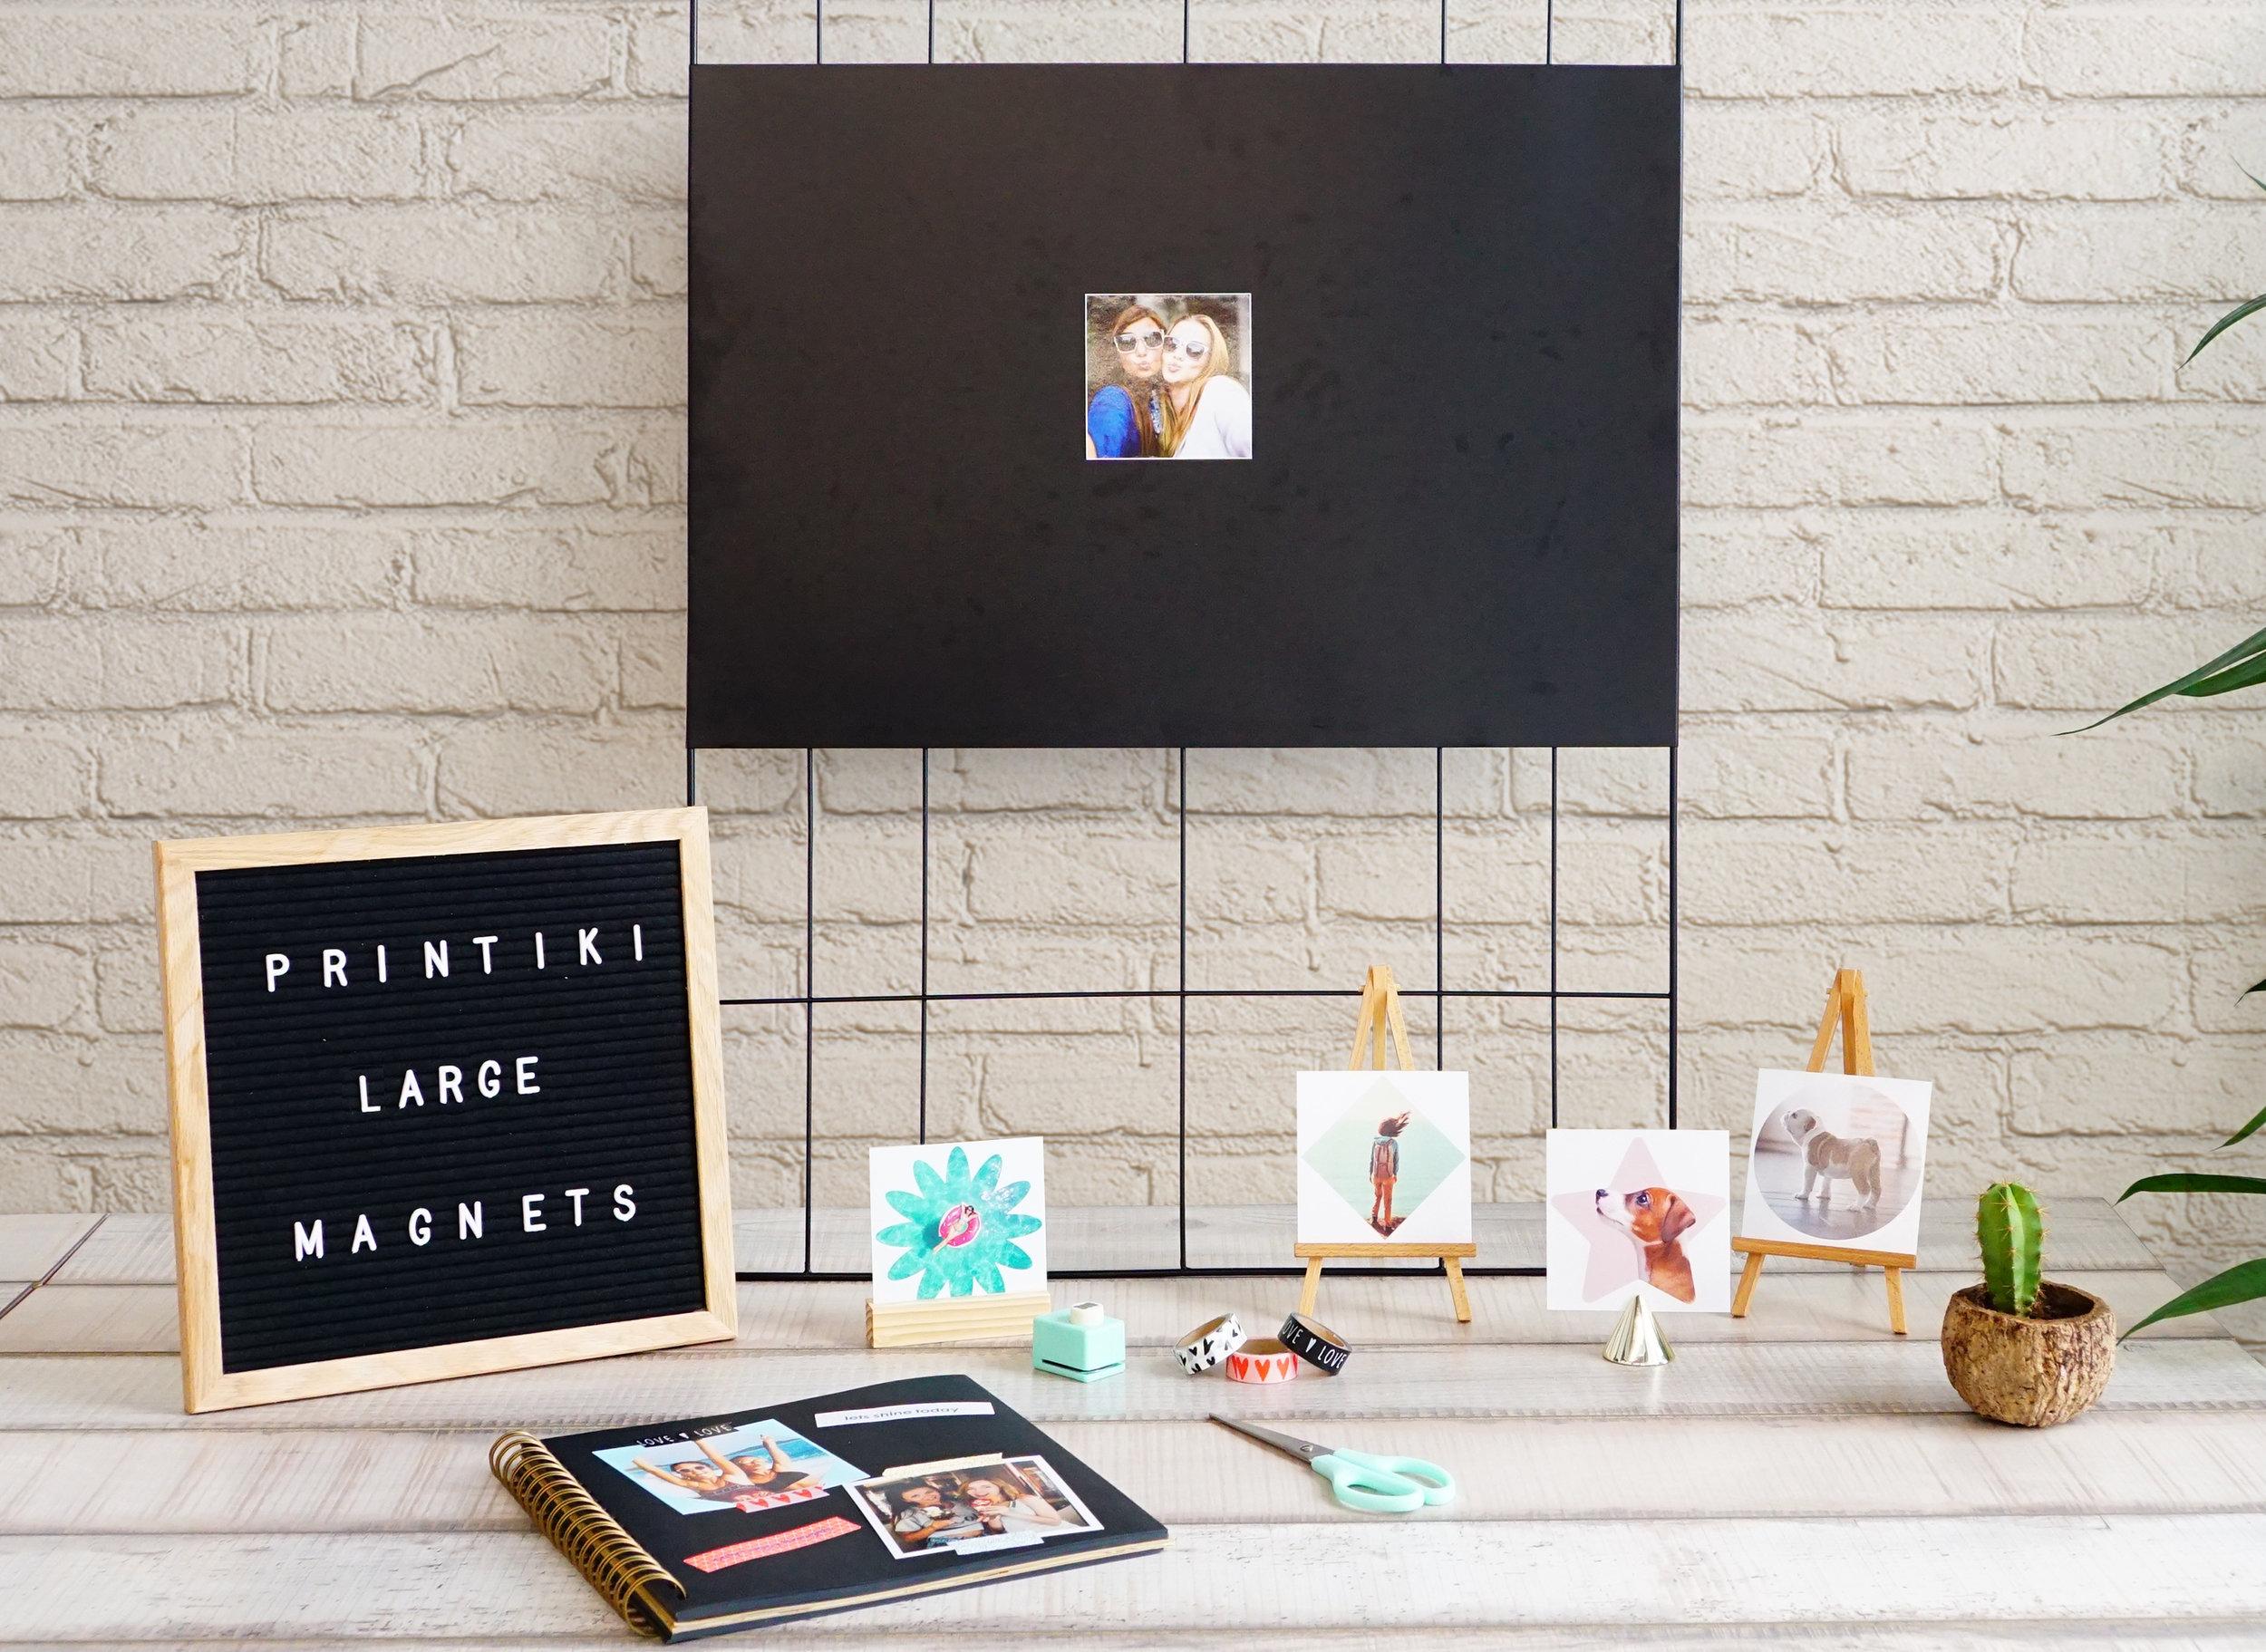 Large-Magnets-Home-decor.jpg